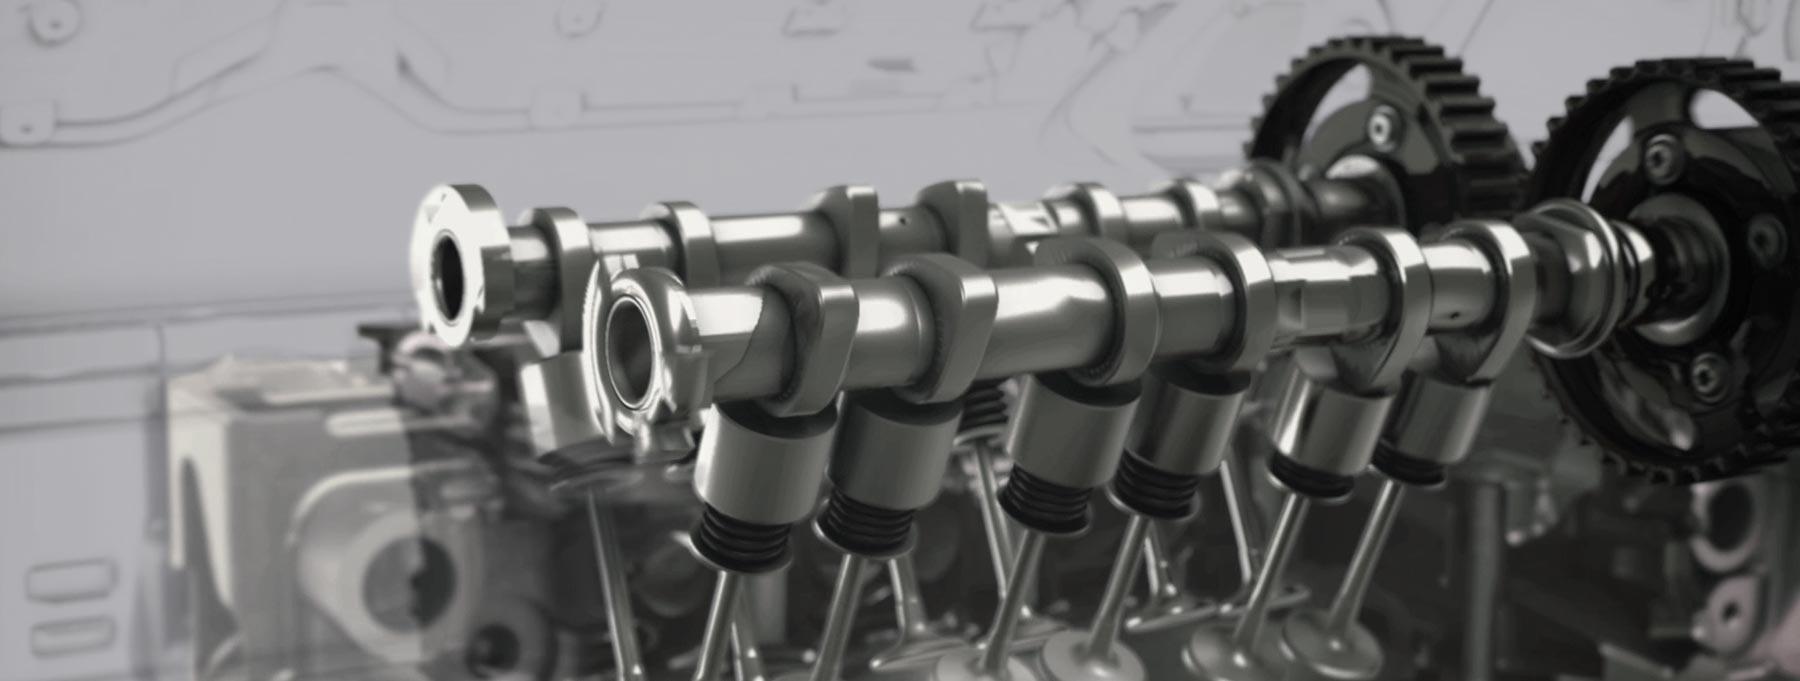 Motorisations - PureTech